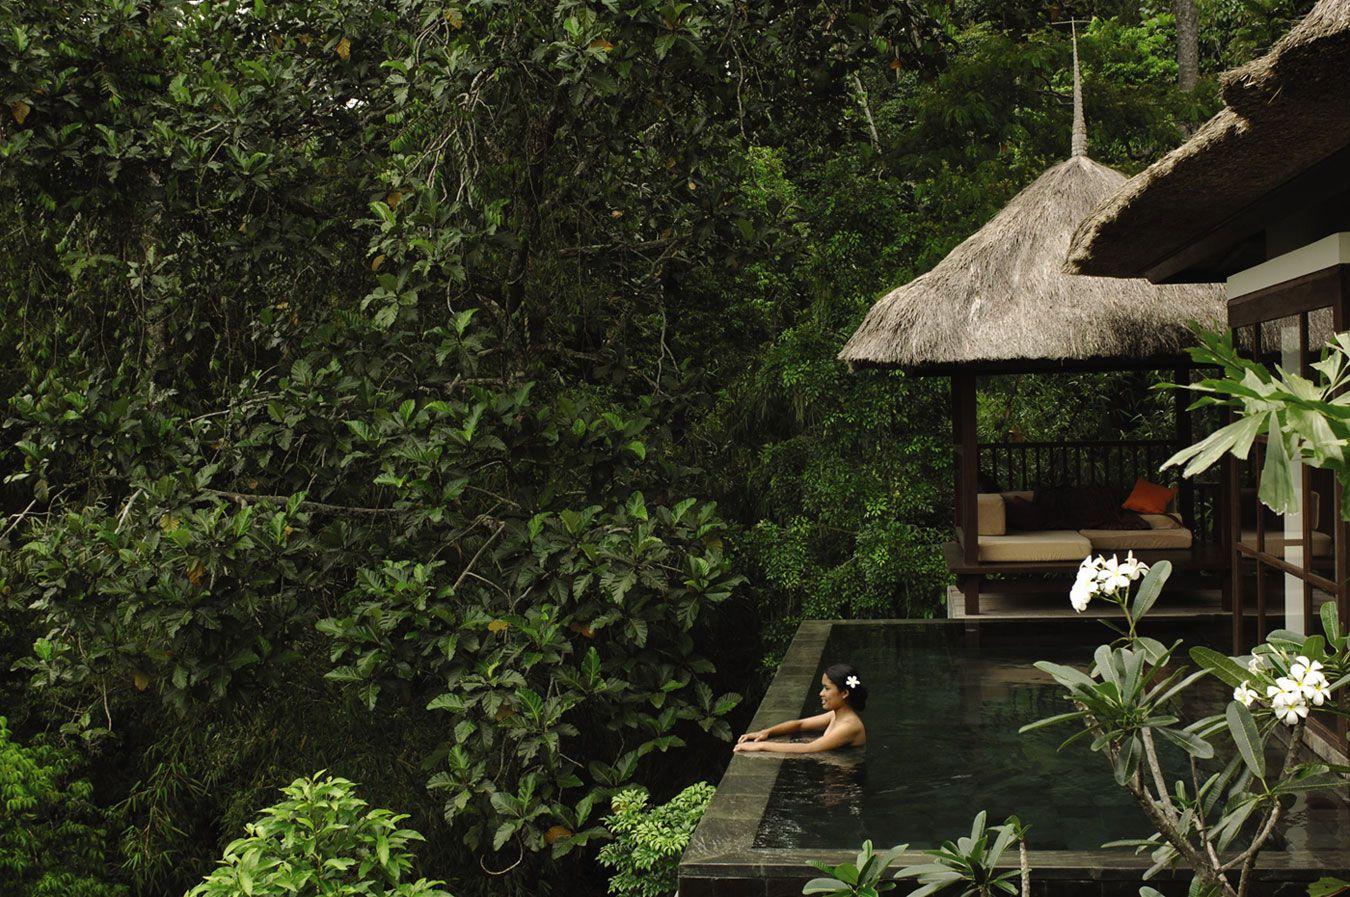 Ubud-Hanging-Gardens-03-0